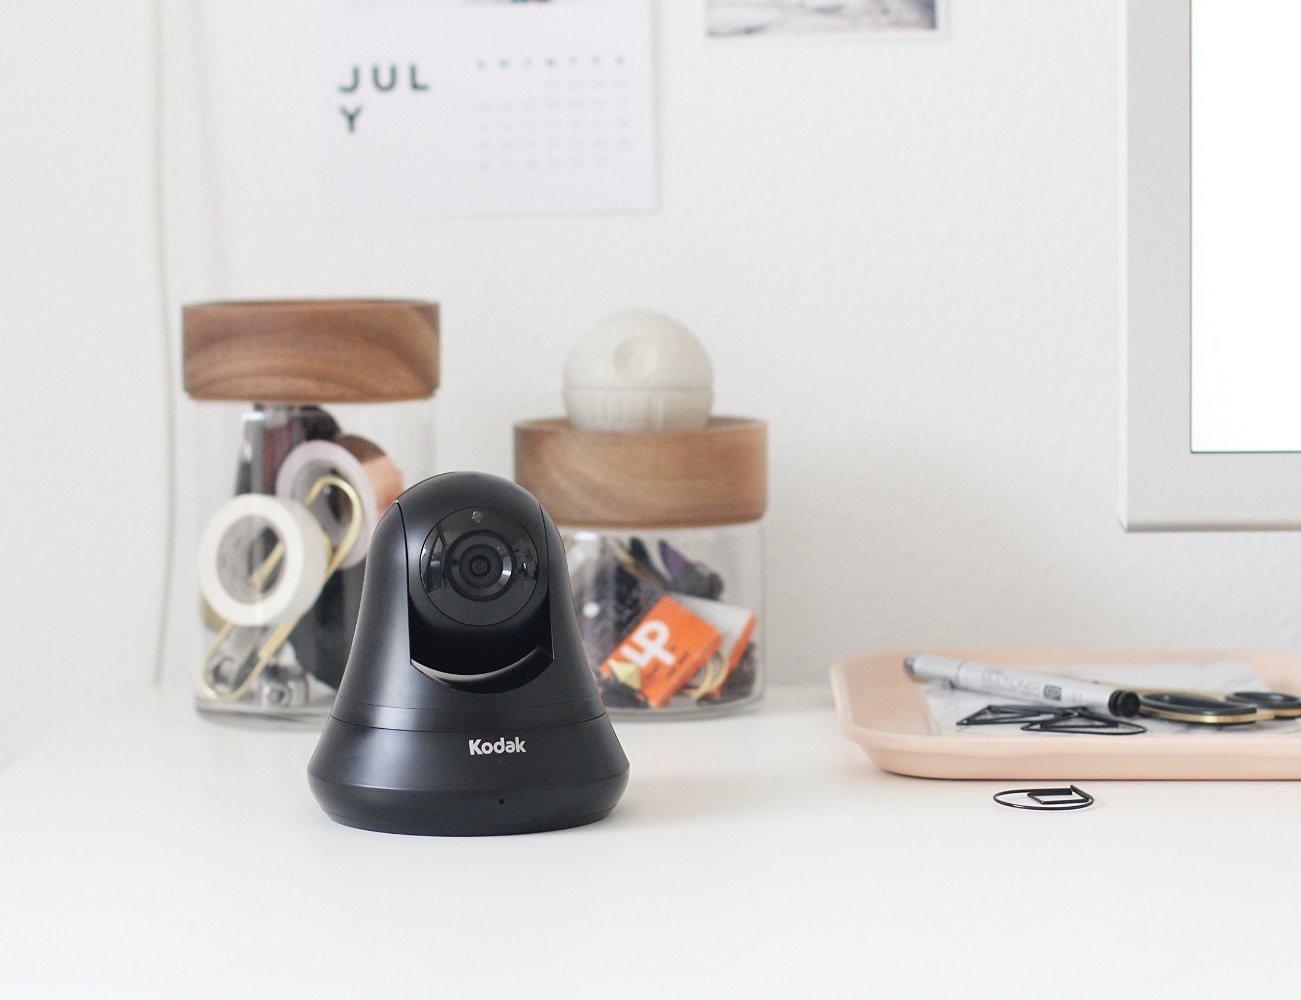 Kodak CFH-V15 – Video Monitoring Security Camera